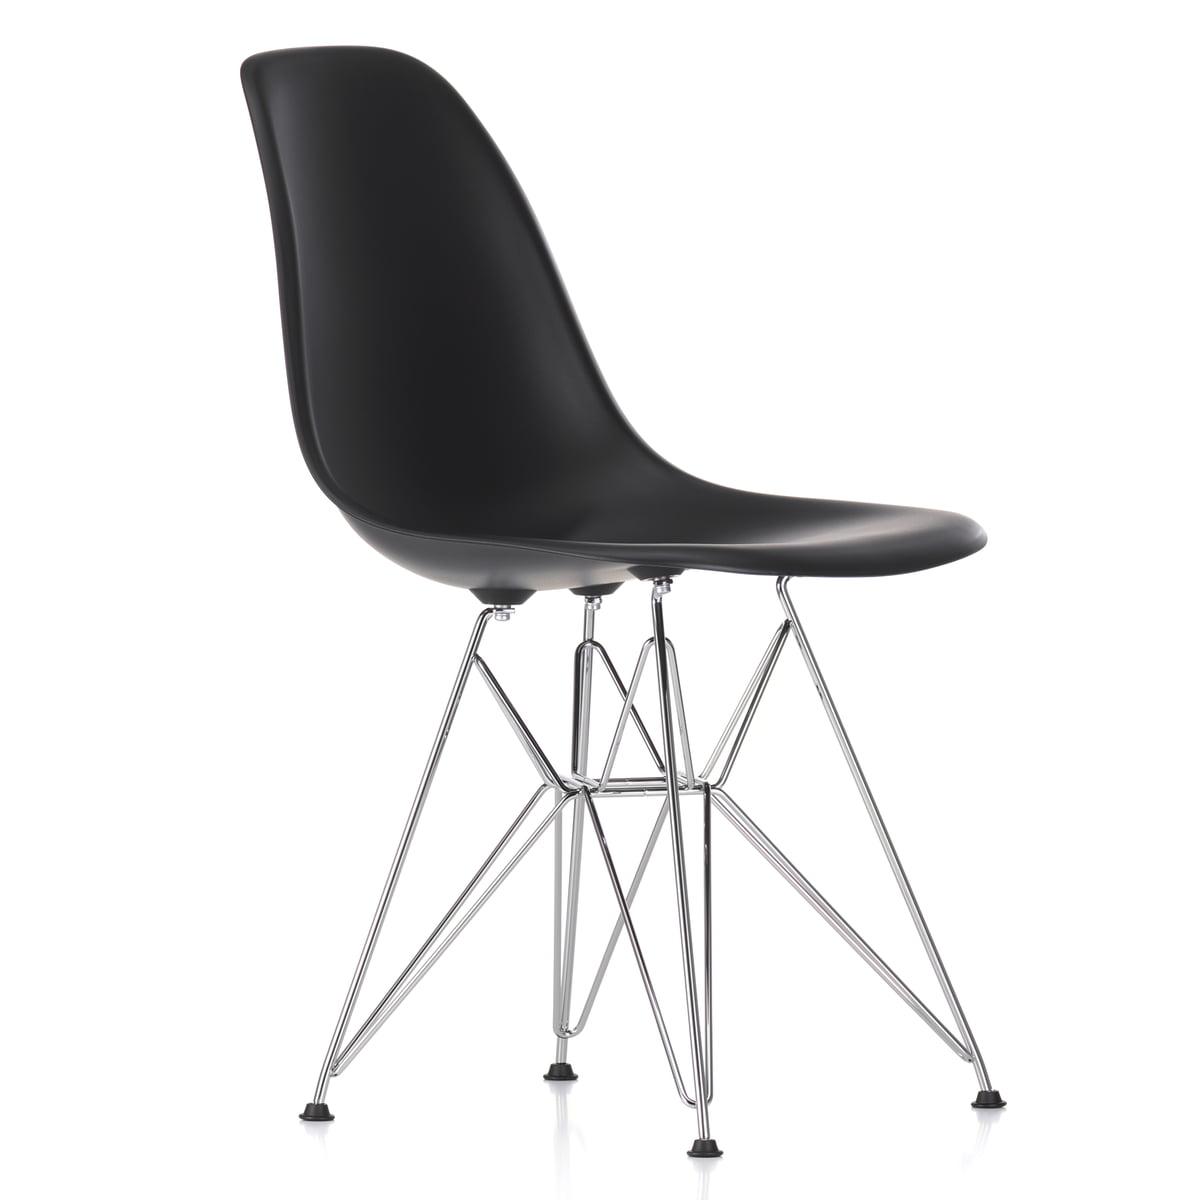 vitra eames plastic side chair dsr h 43 cm verchromt basic dark kunststoffgleiter basic. Black Bedroom Furniture Sets. Home Design Ideas